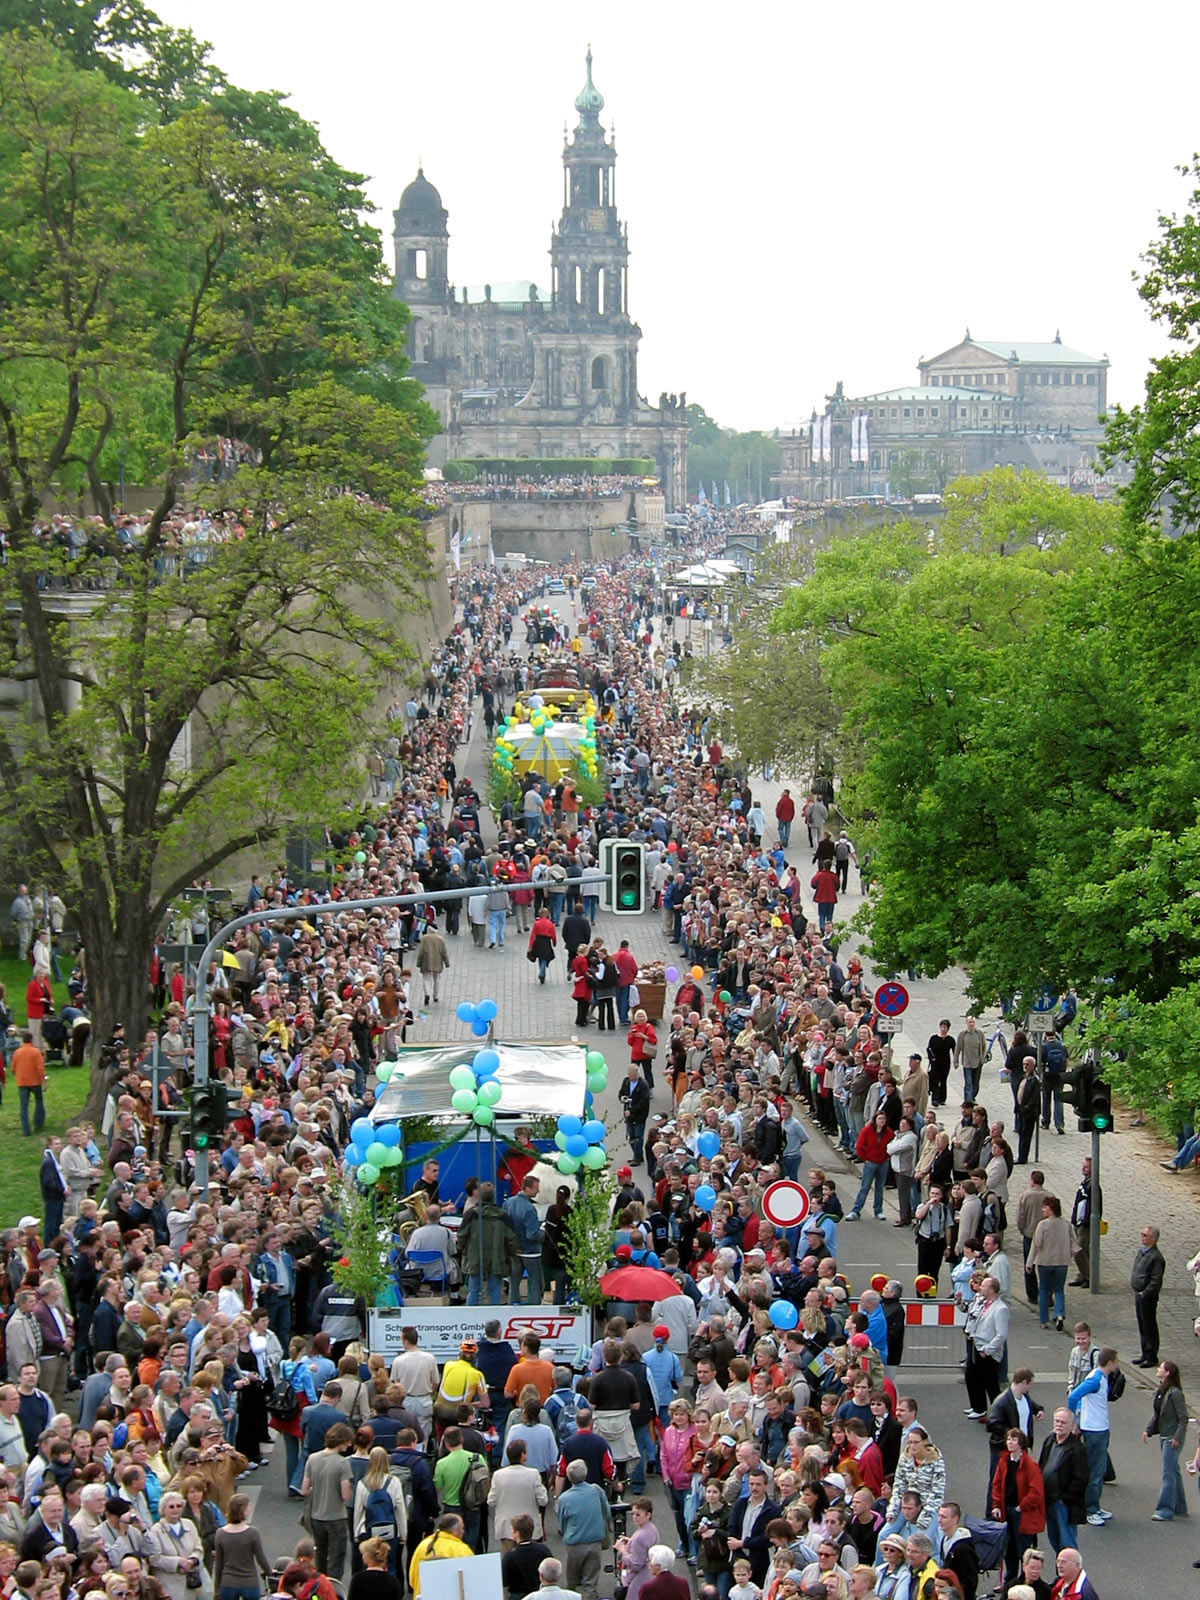 https://i1.wp.com/upload.wikimedia.org/wikipedia/commons/3/31/Dixieland-Festival_Dresden_2006.jpg